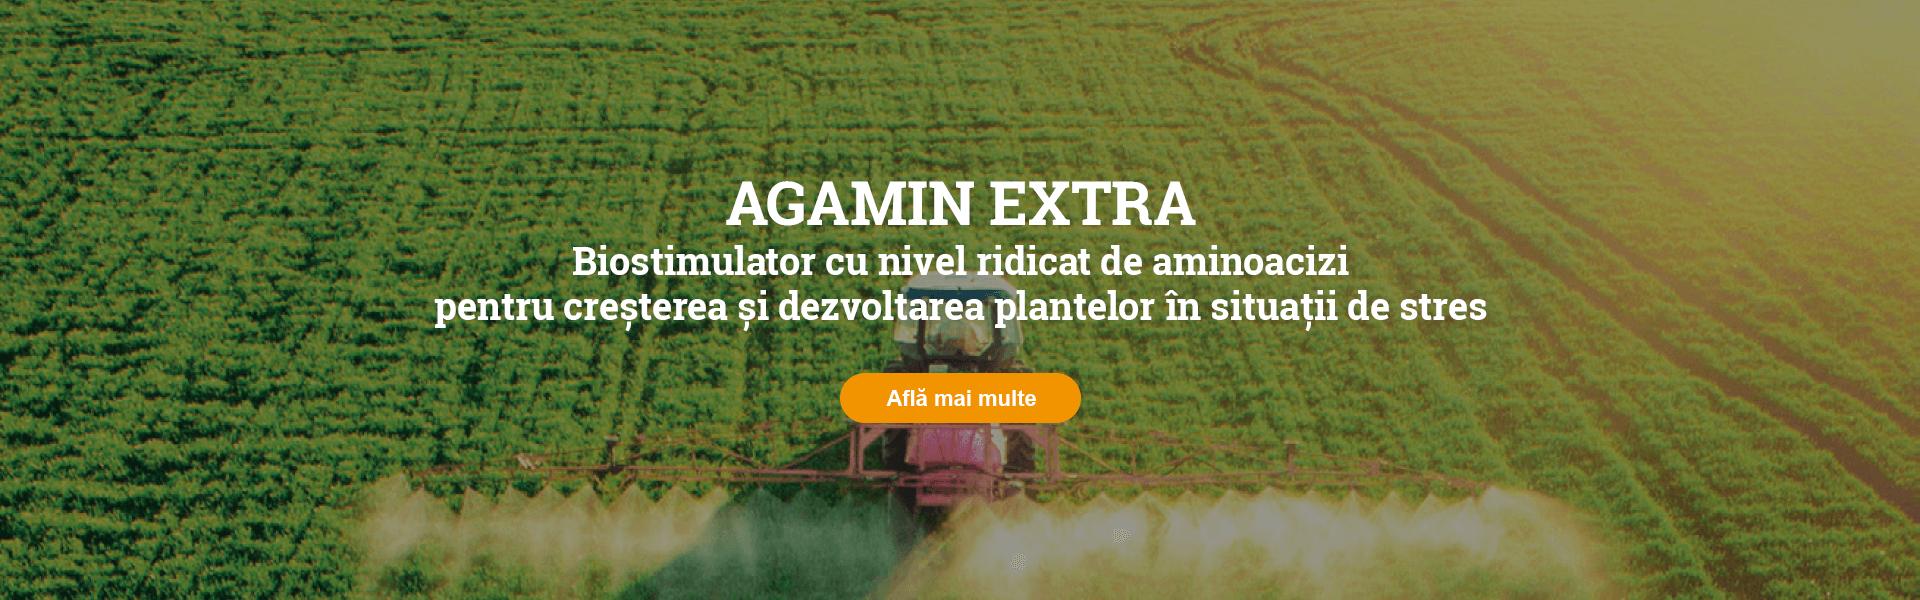 biostimulator Agamin extra